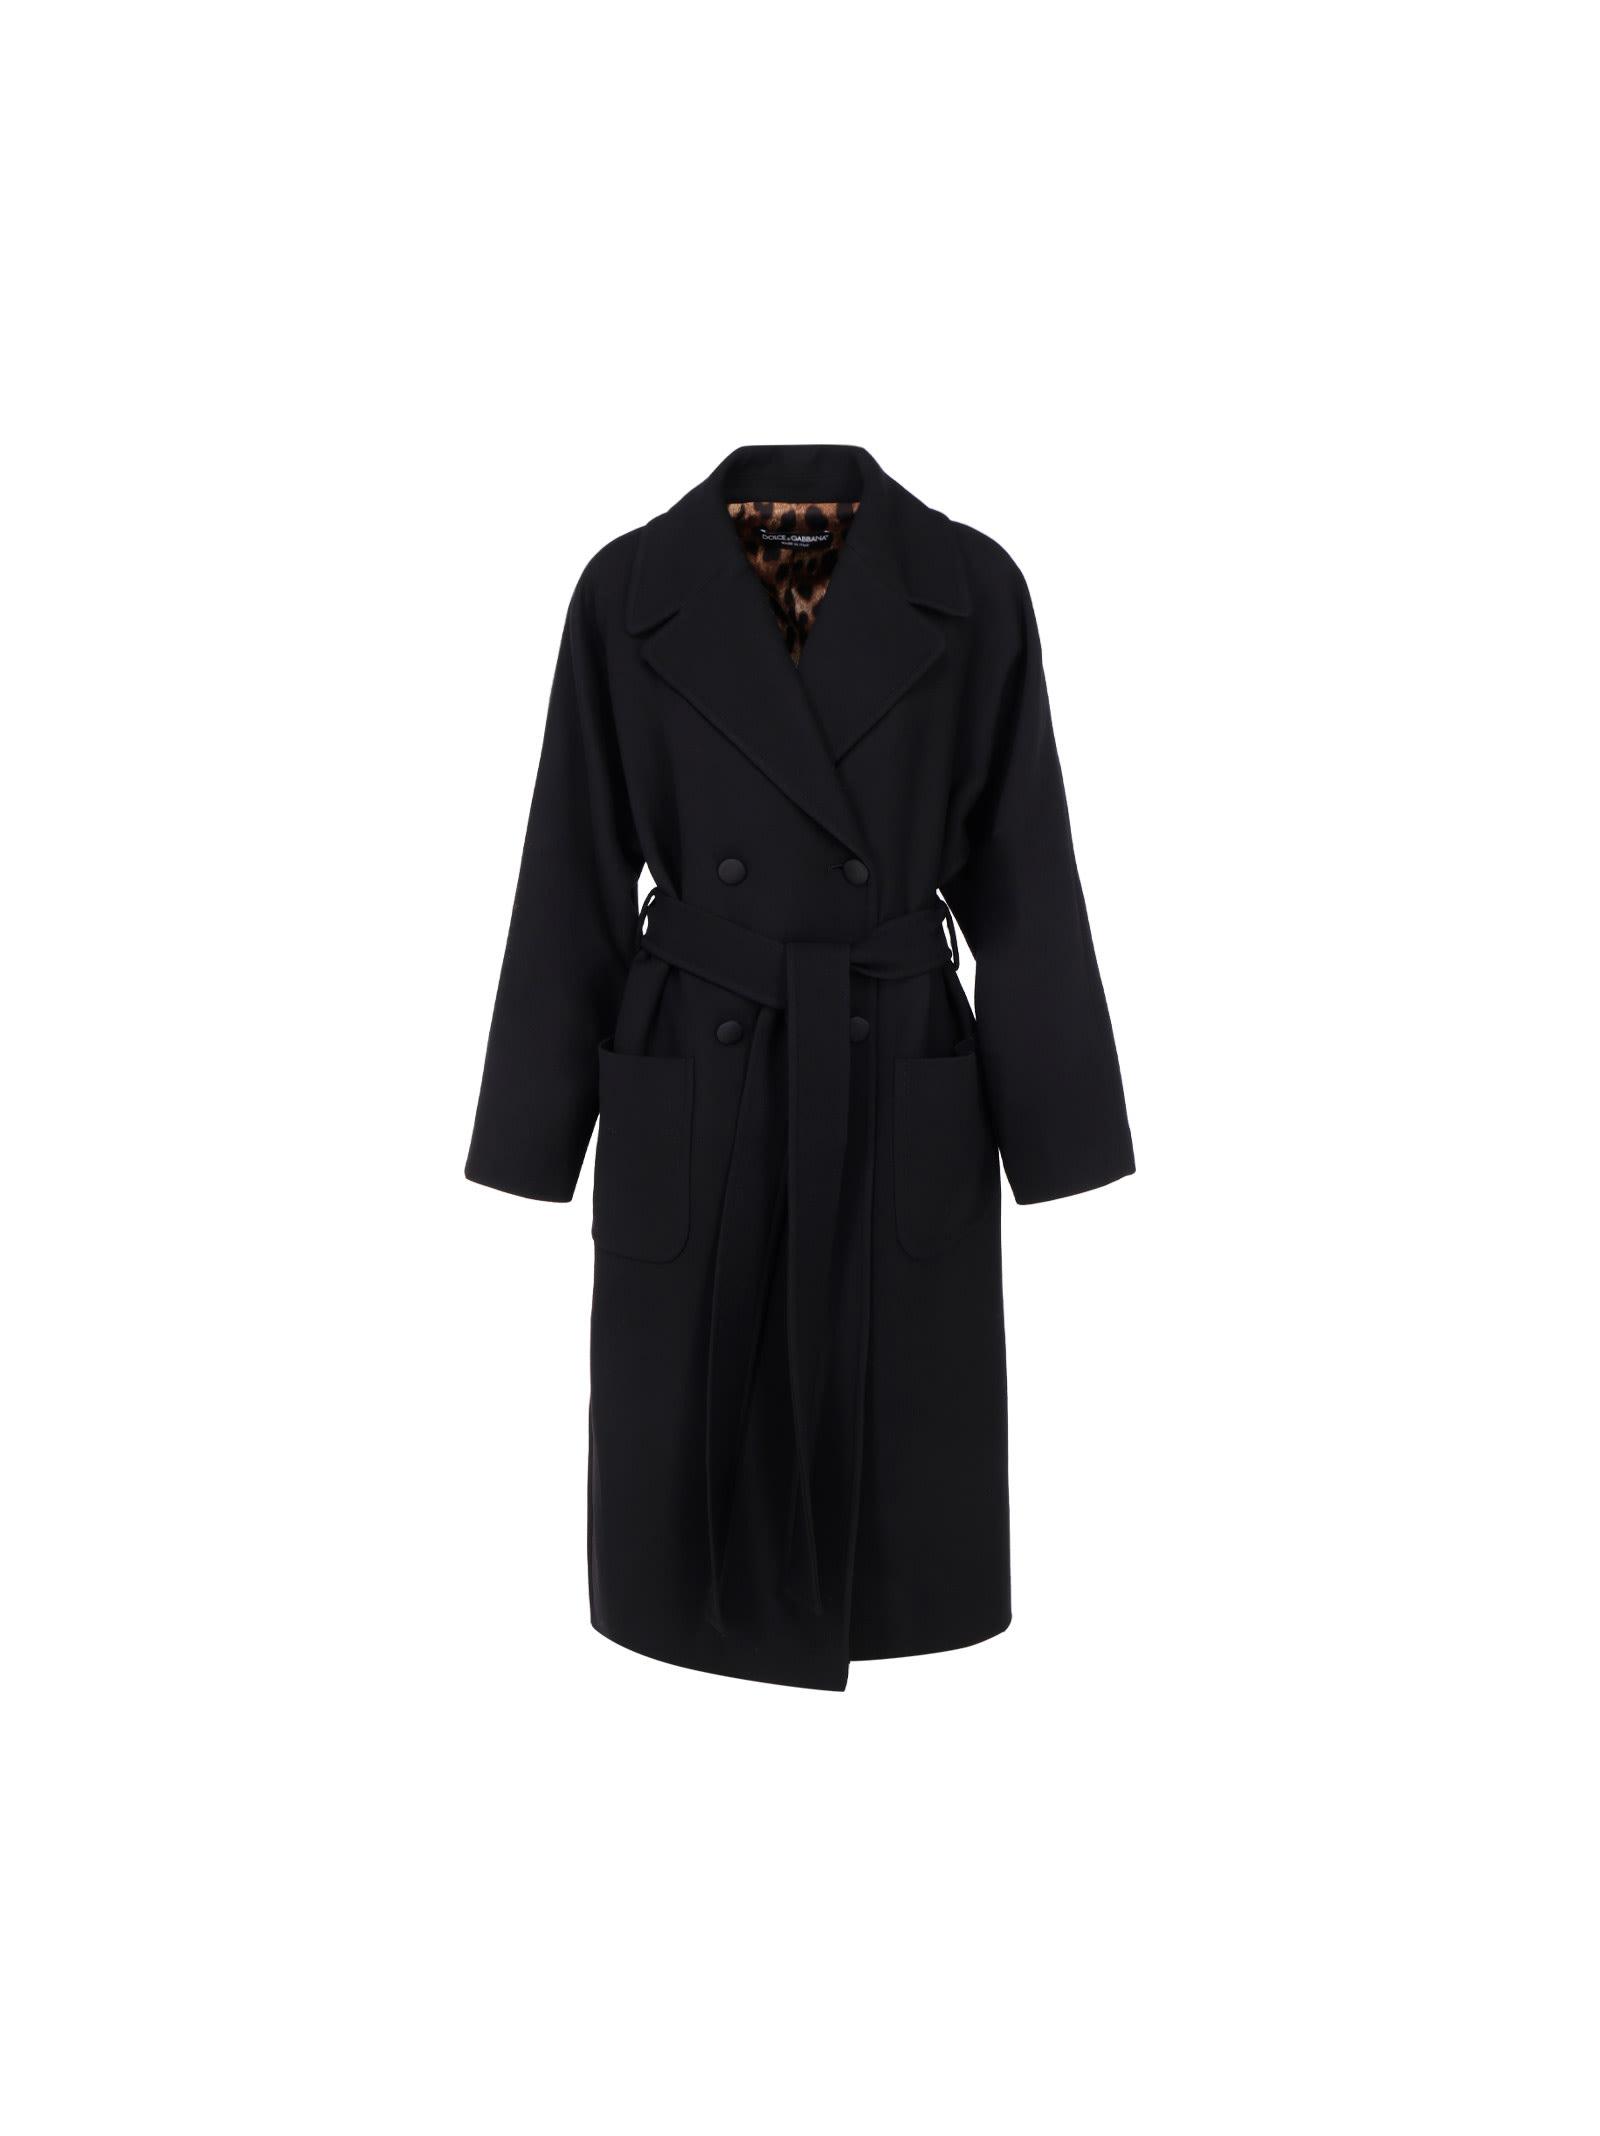 Dolce & Gabbana Linings COAT